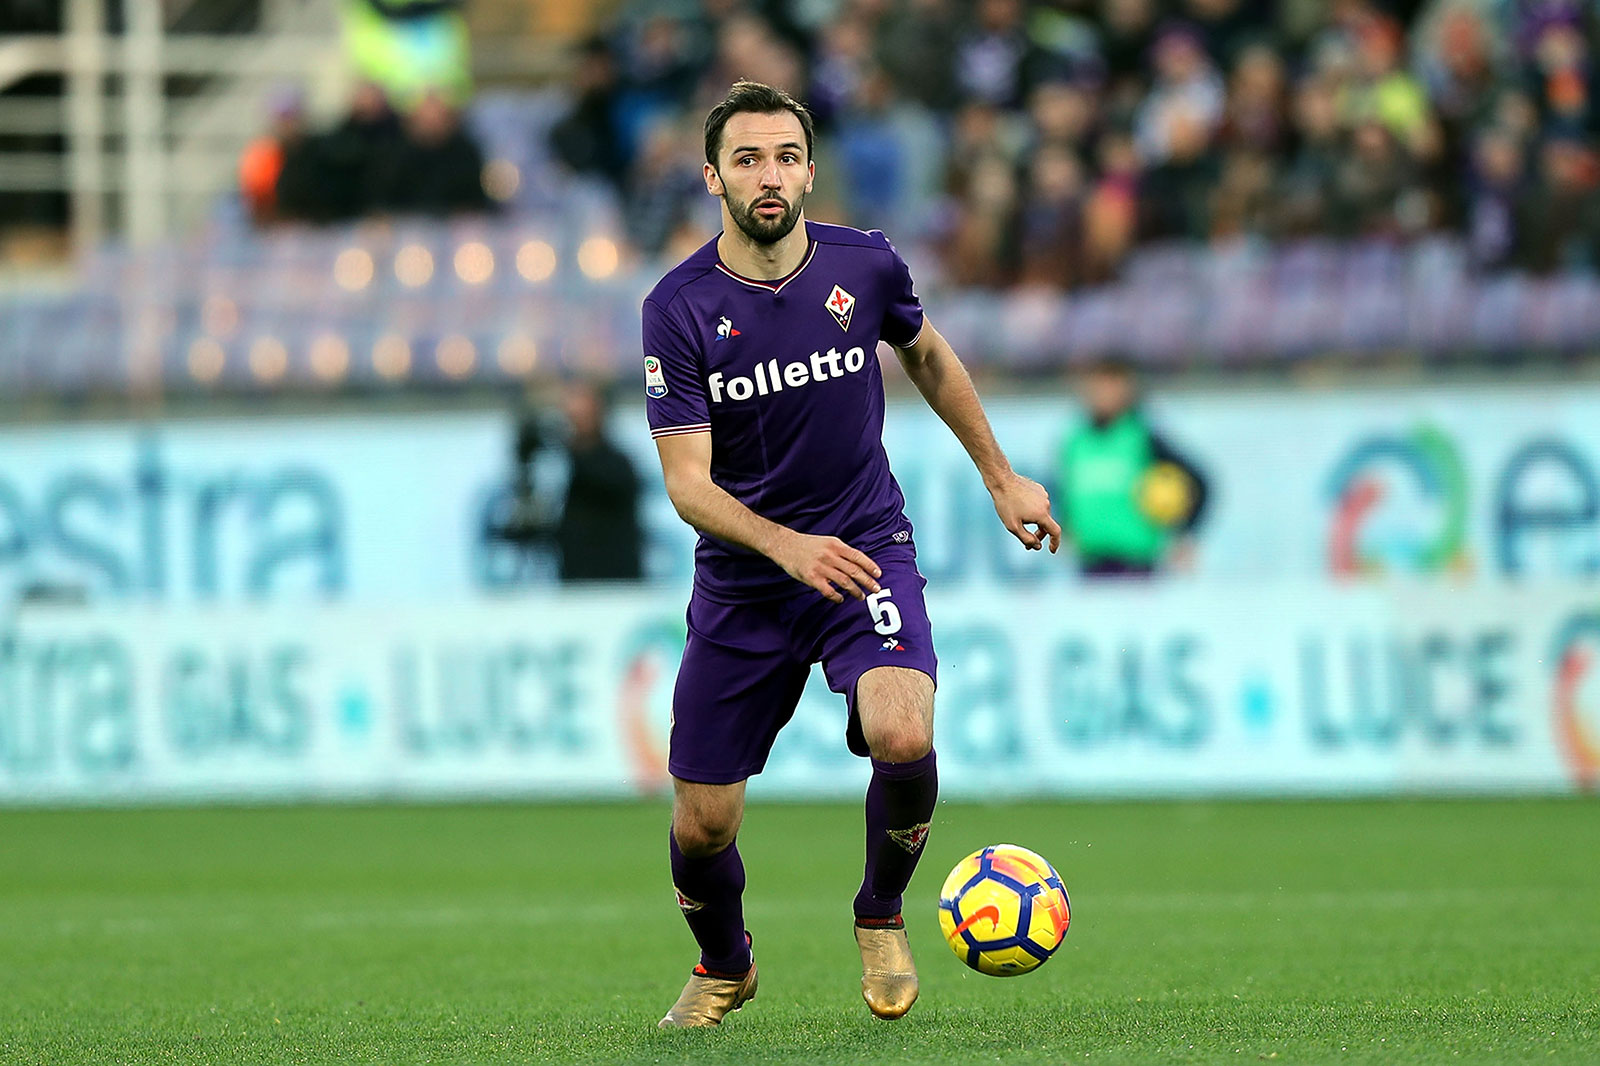 Milan Badelj during Fiorentina-Genoa at Stadio Artemio Franchi on December 17, 2017. (Photo by Gabriele Maltinti/Getty Images)